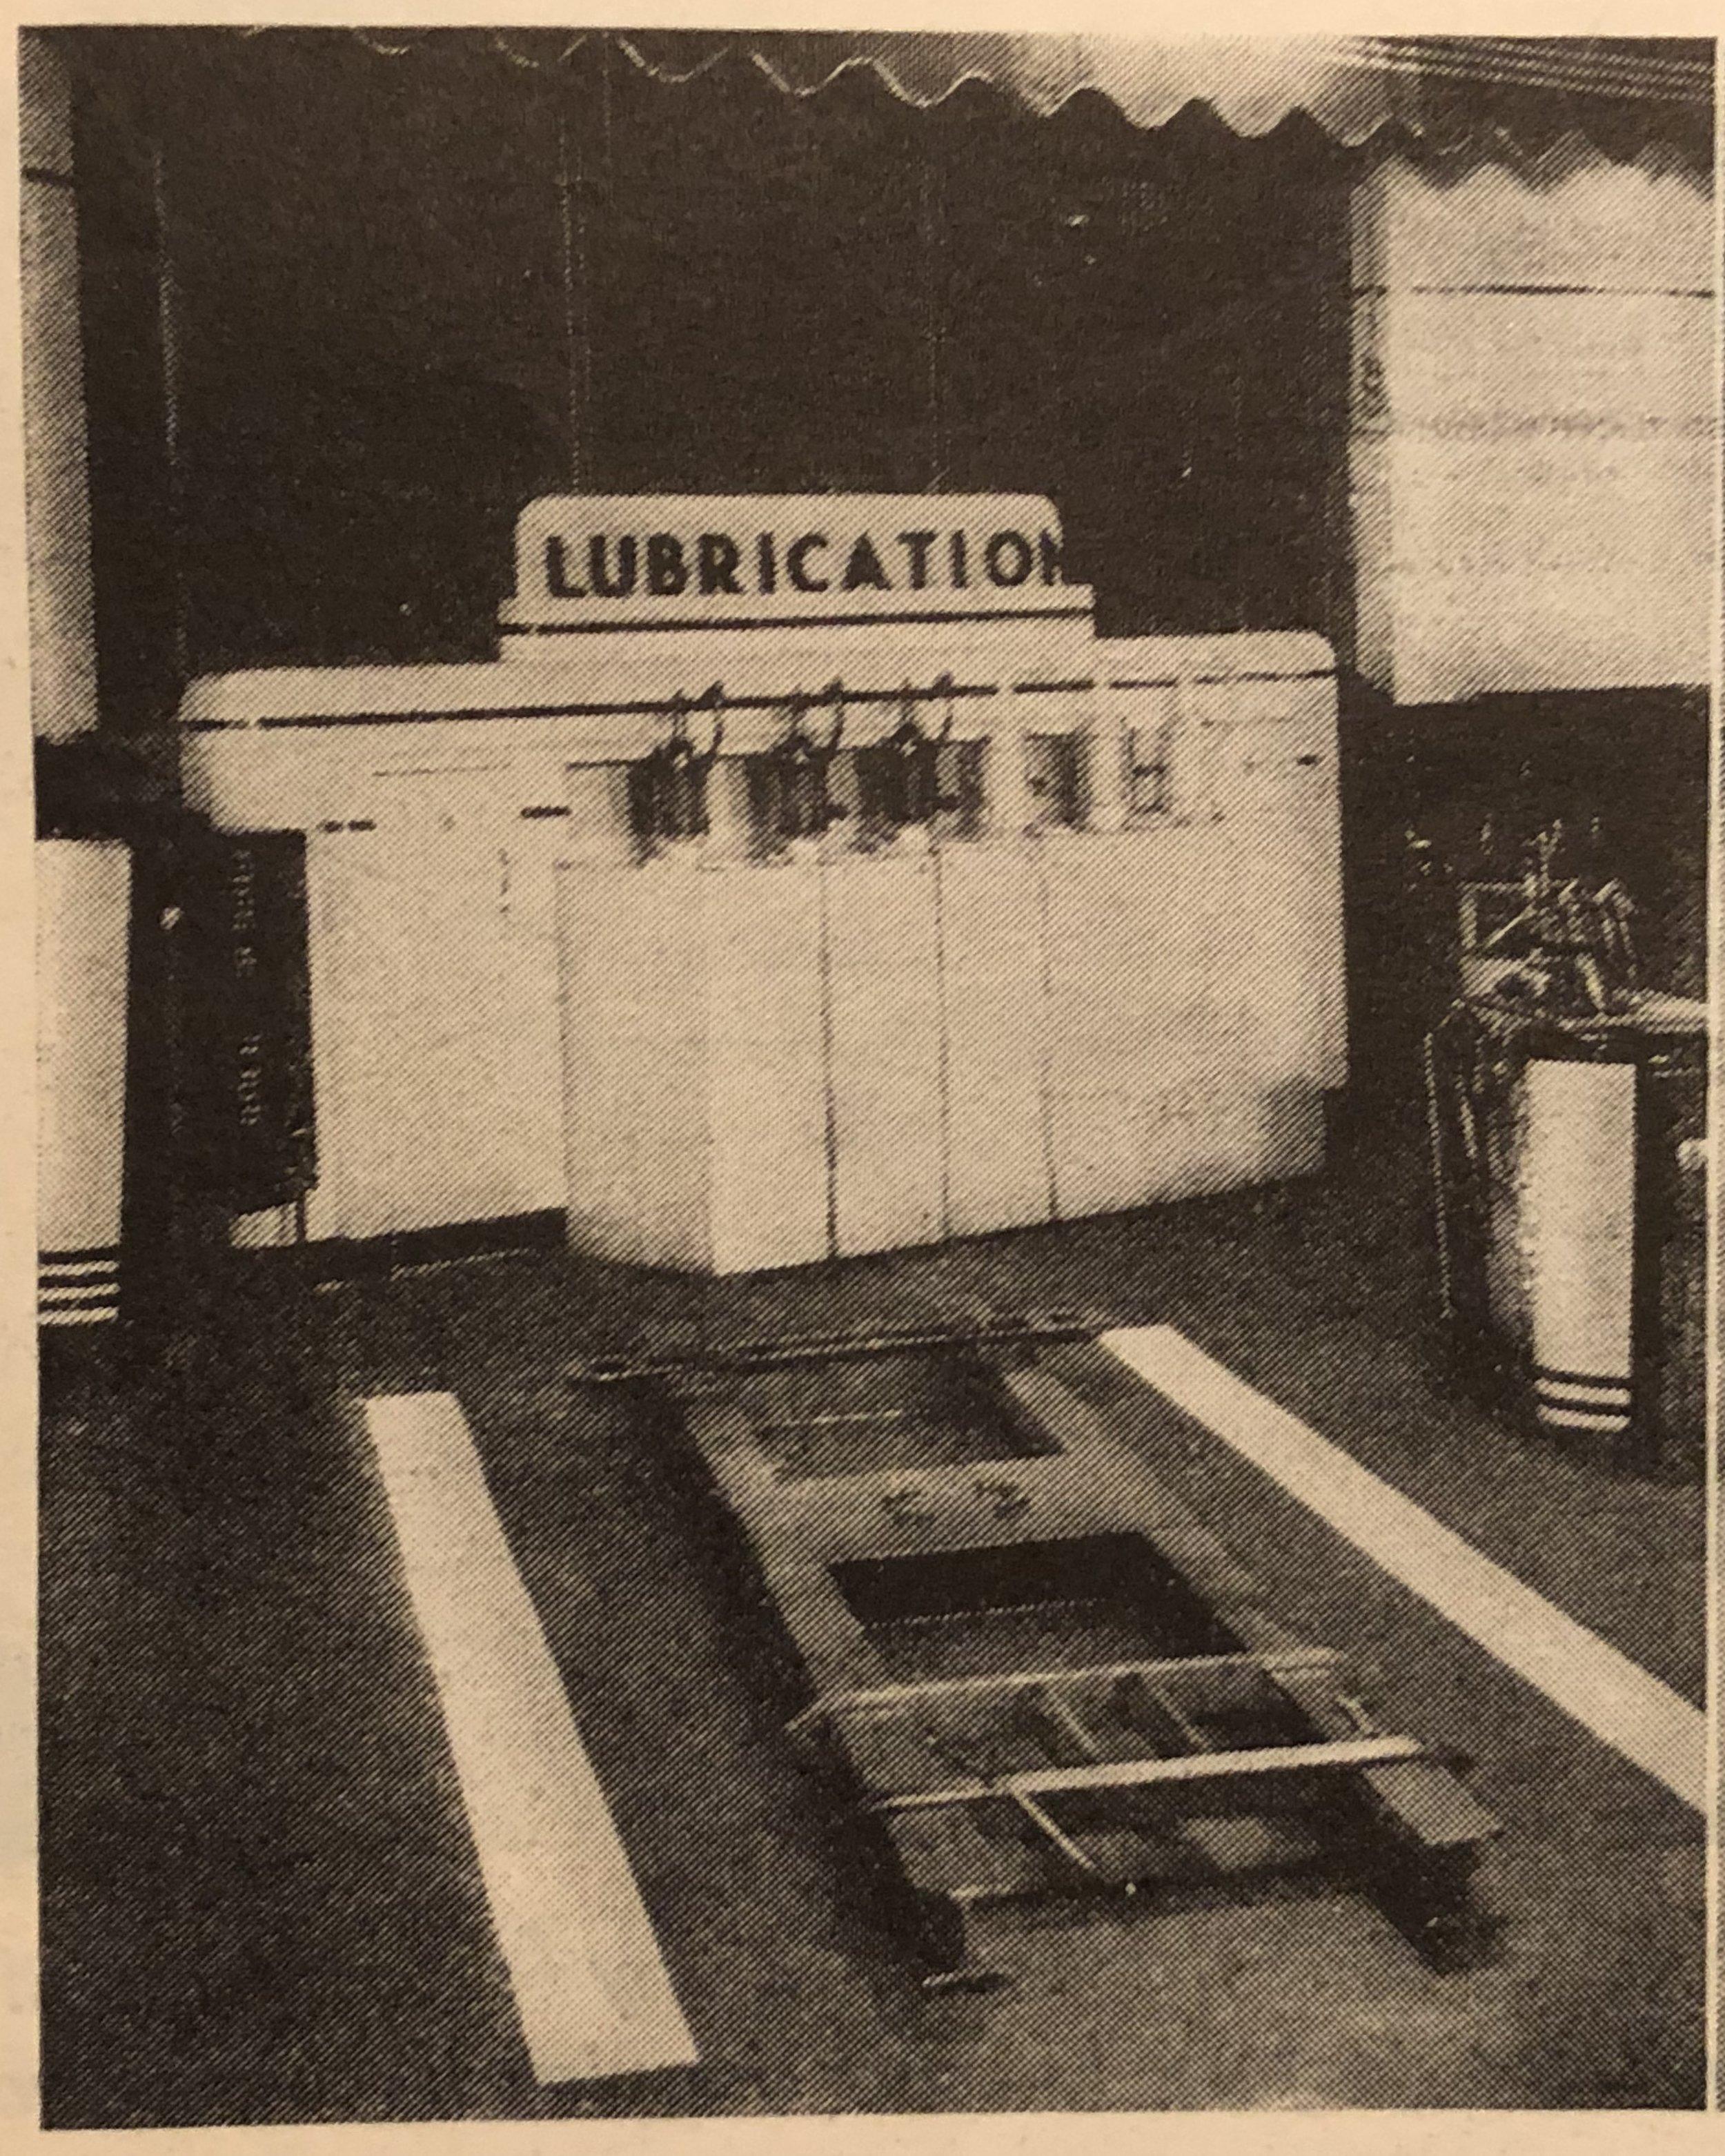 Alemite_Lubrication_cabinet.jpg